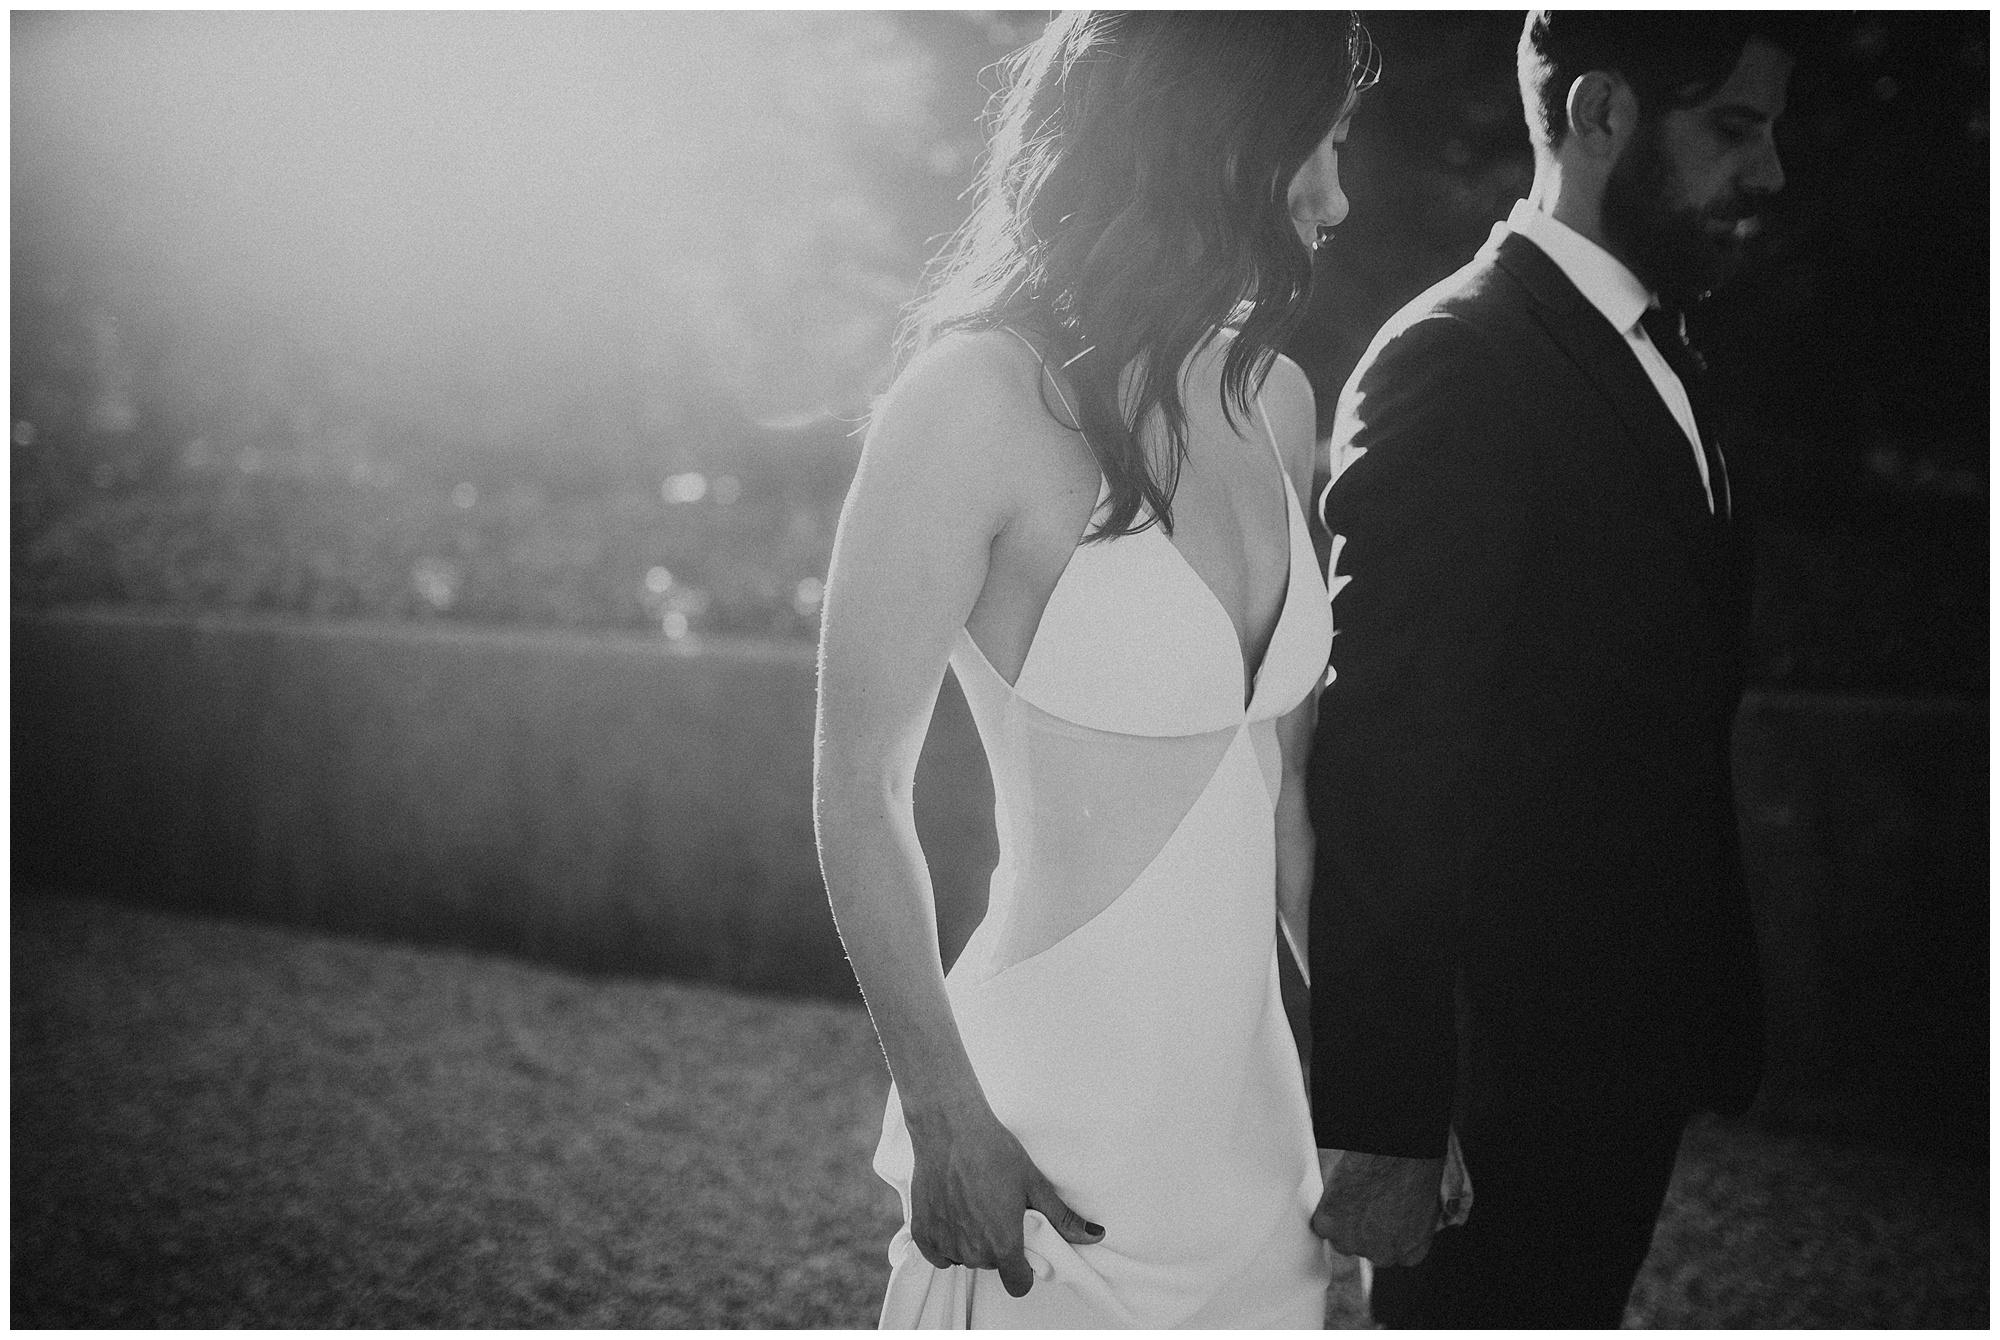 allerton_park_wedding_champaign_il_chicago_wright_photographs_ne_0097.jpg